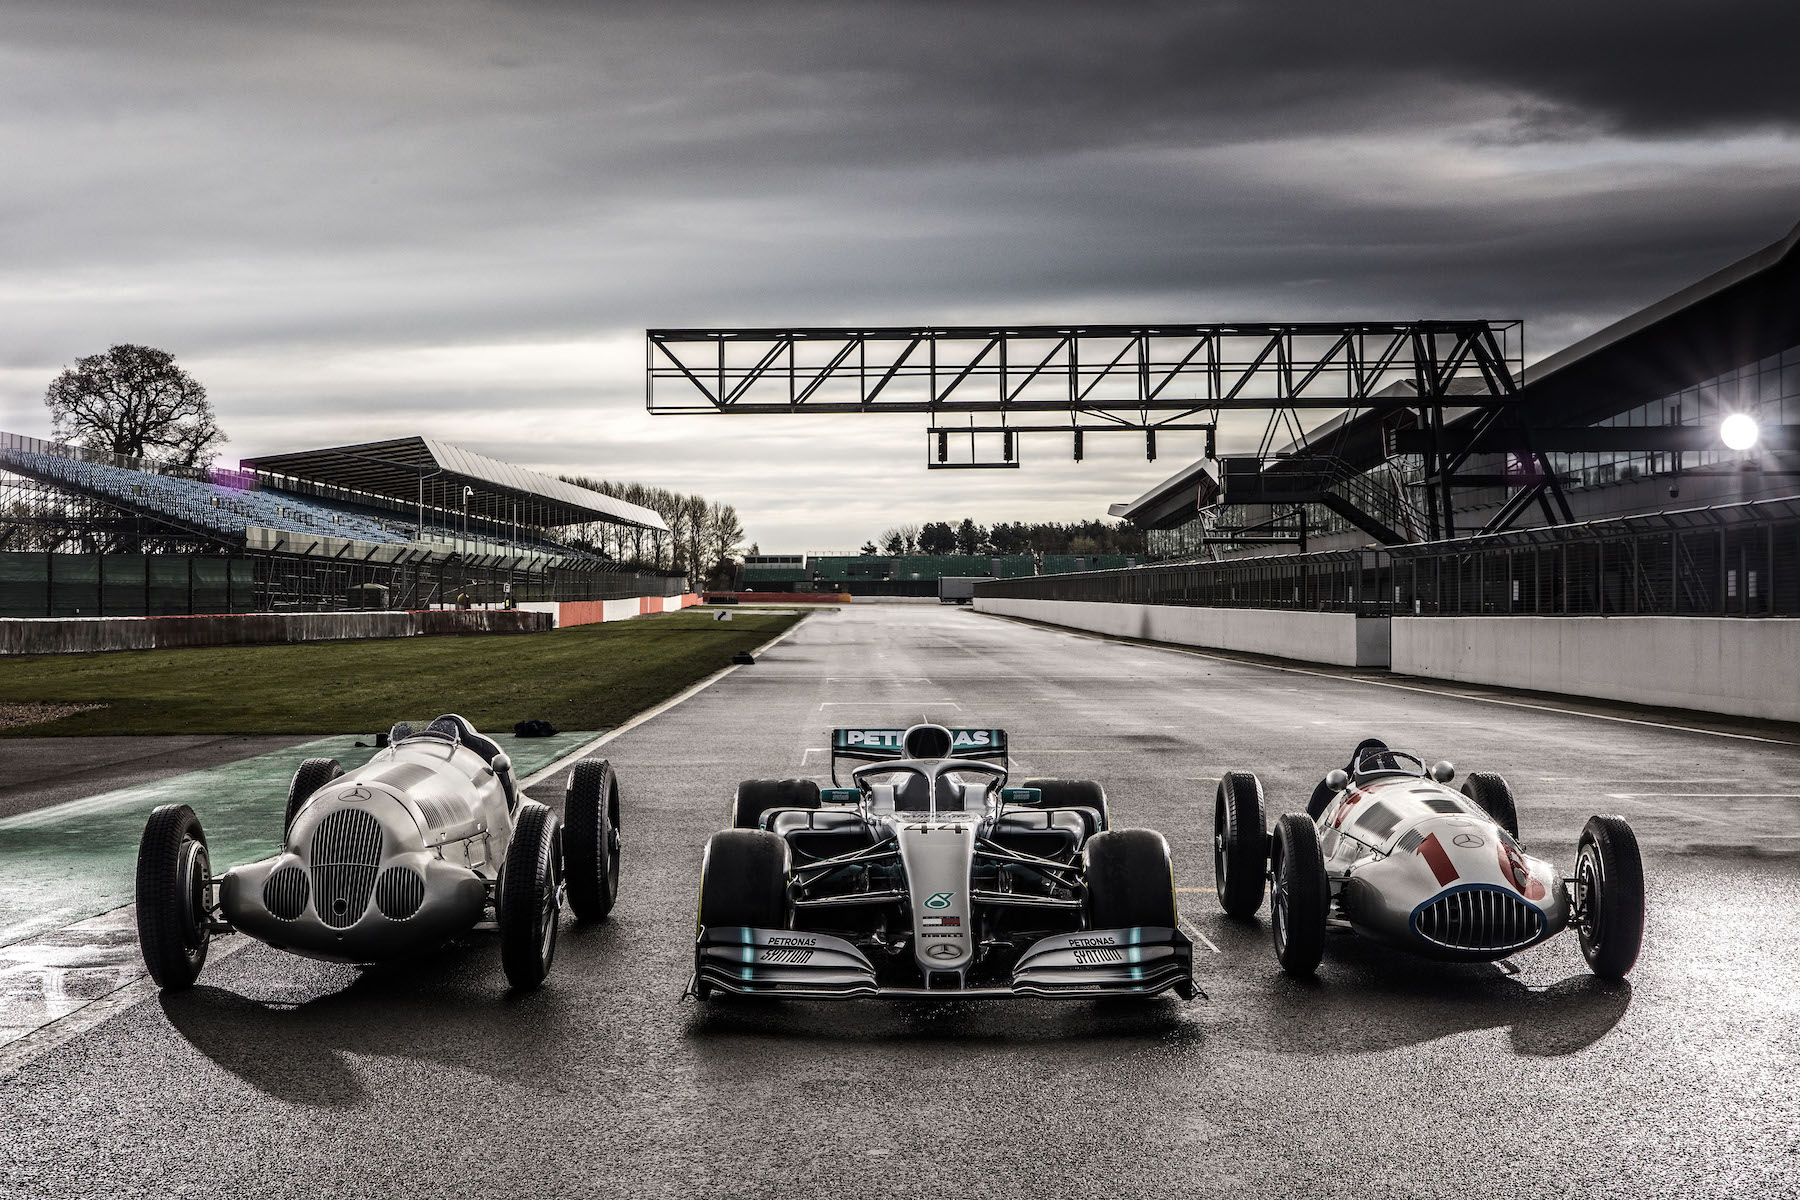 2019 Mercedes 125 years in Motorsports celebration | 2019 Silverstone 13.jpg